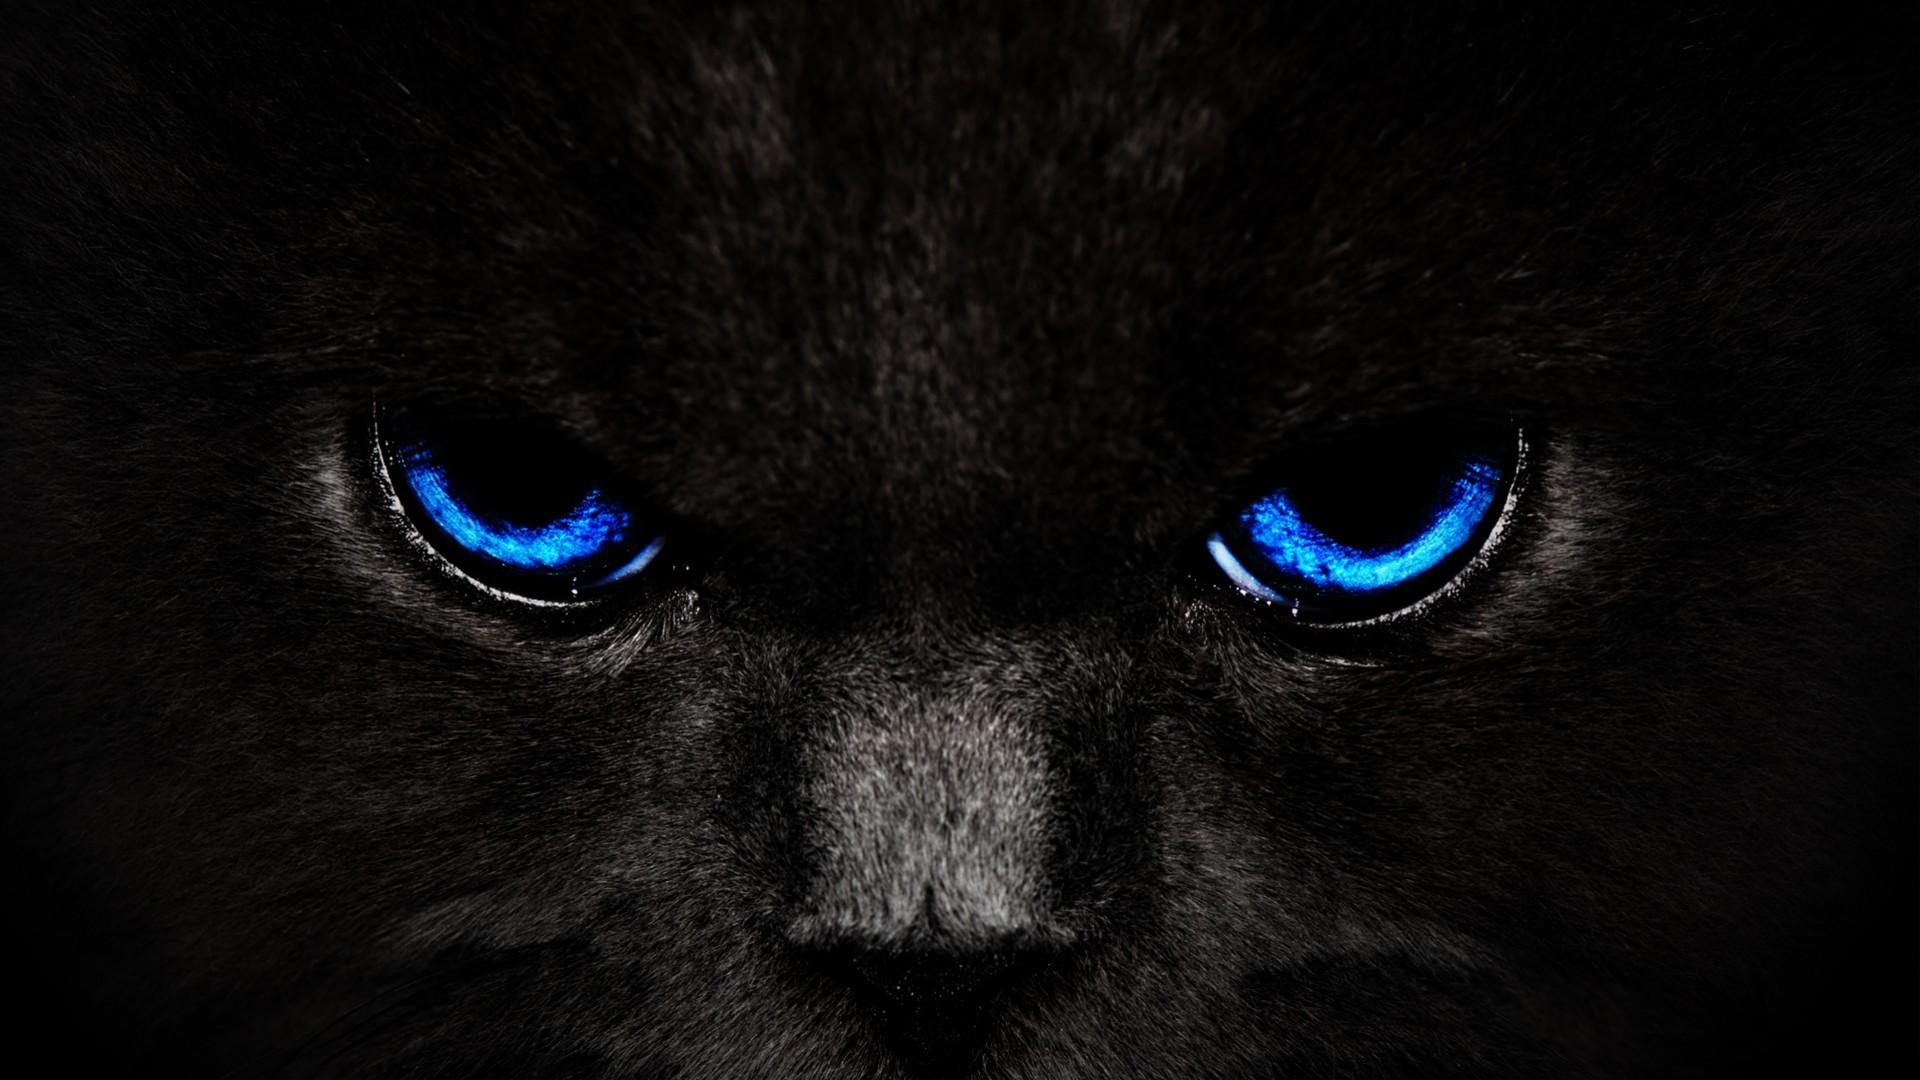 Animals Blue Eyes Cats Awesome Desktop HD Wallpaper 1920x1080